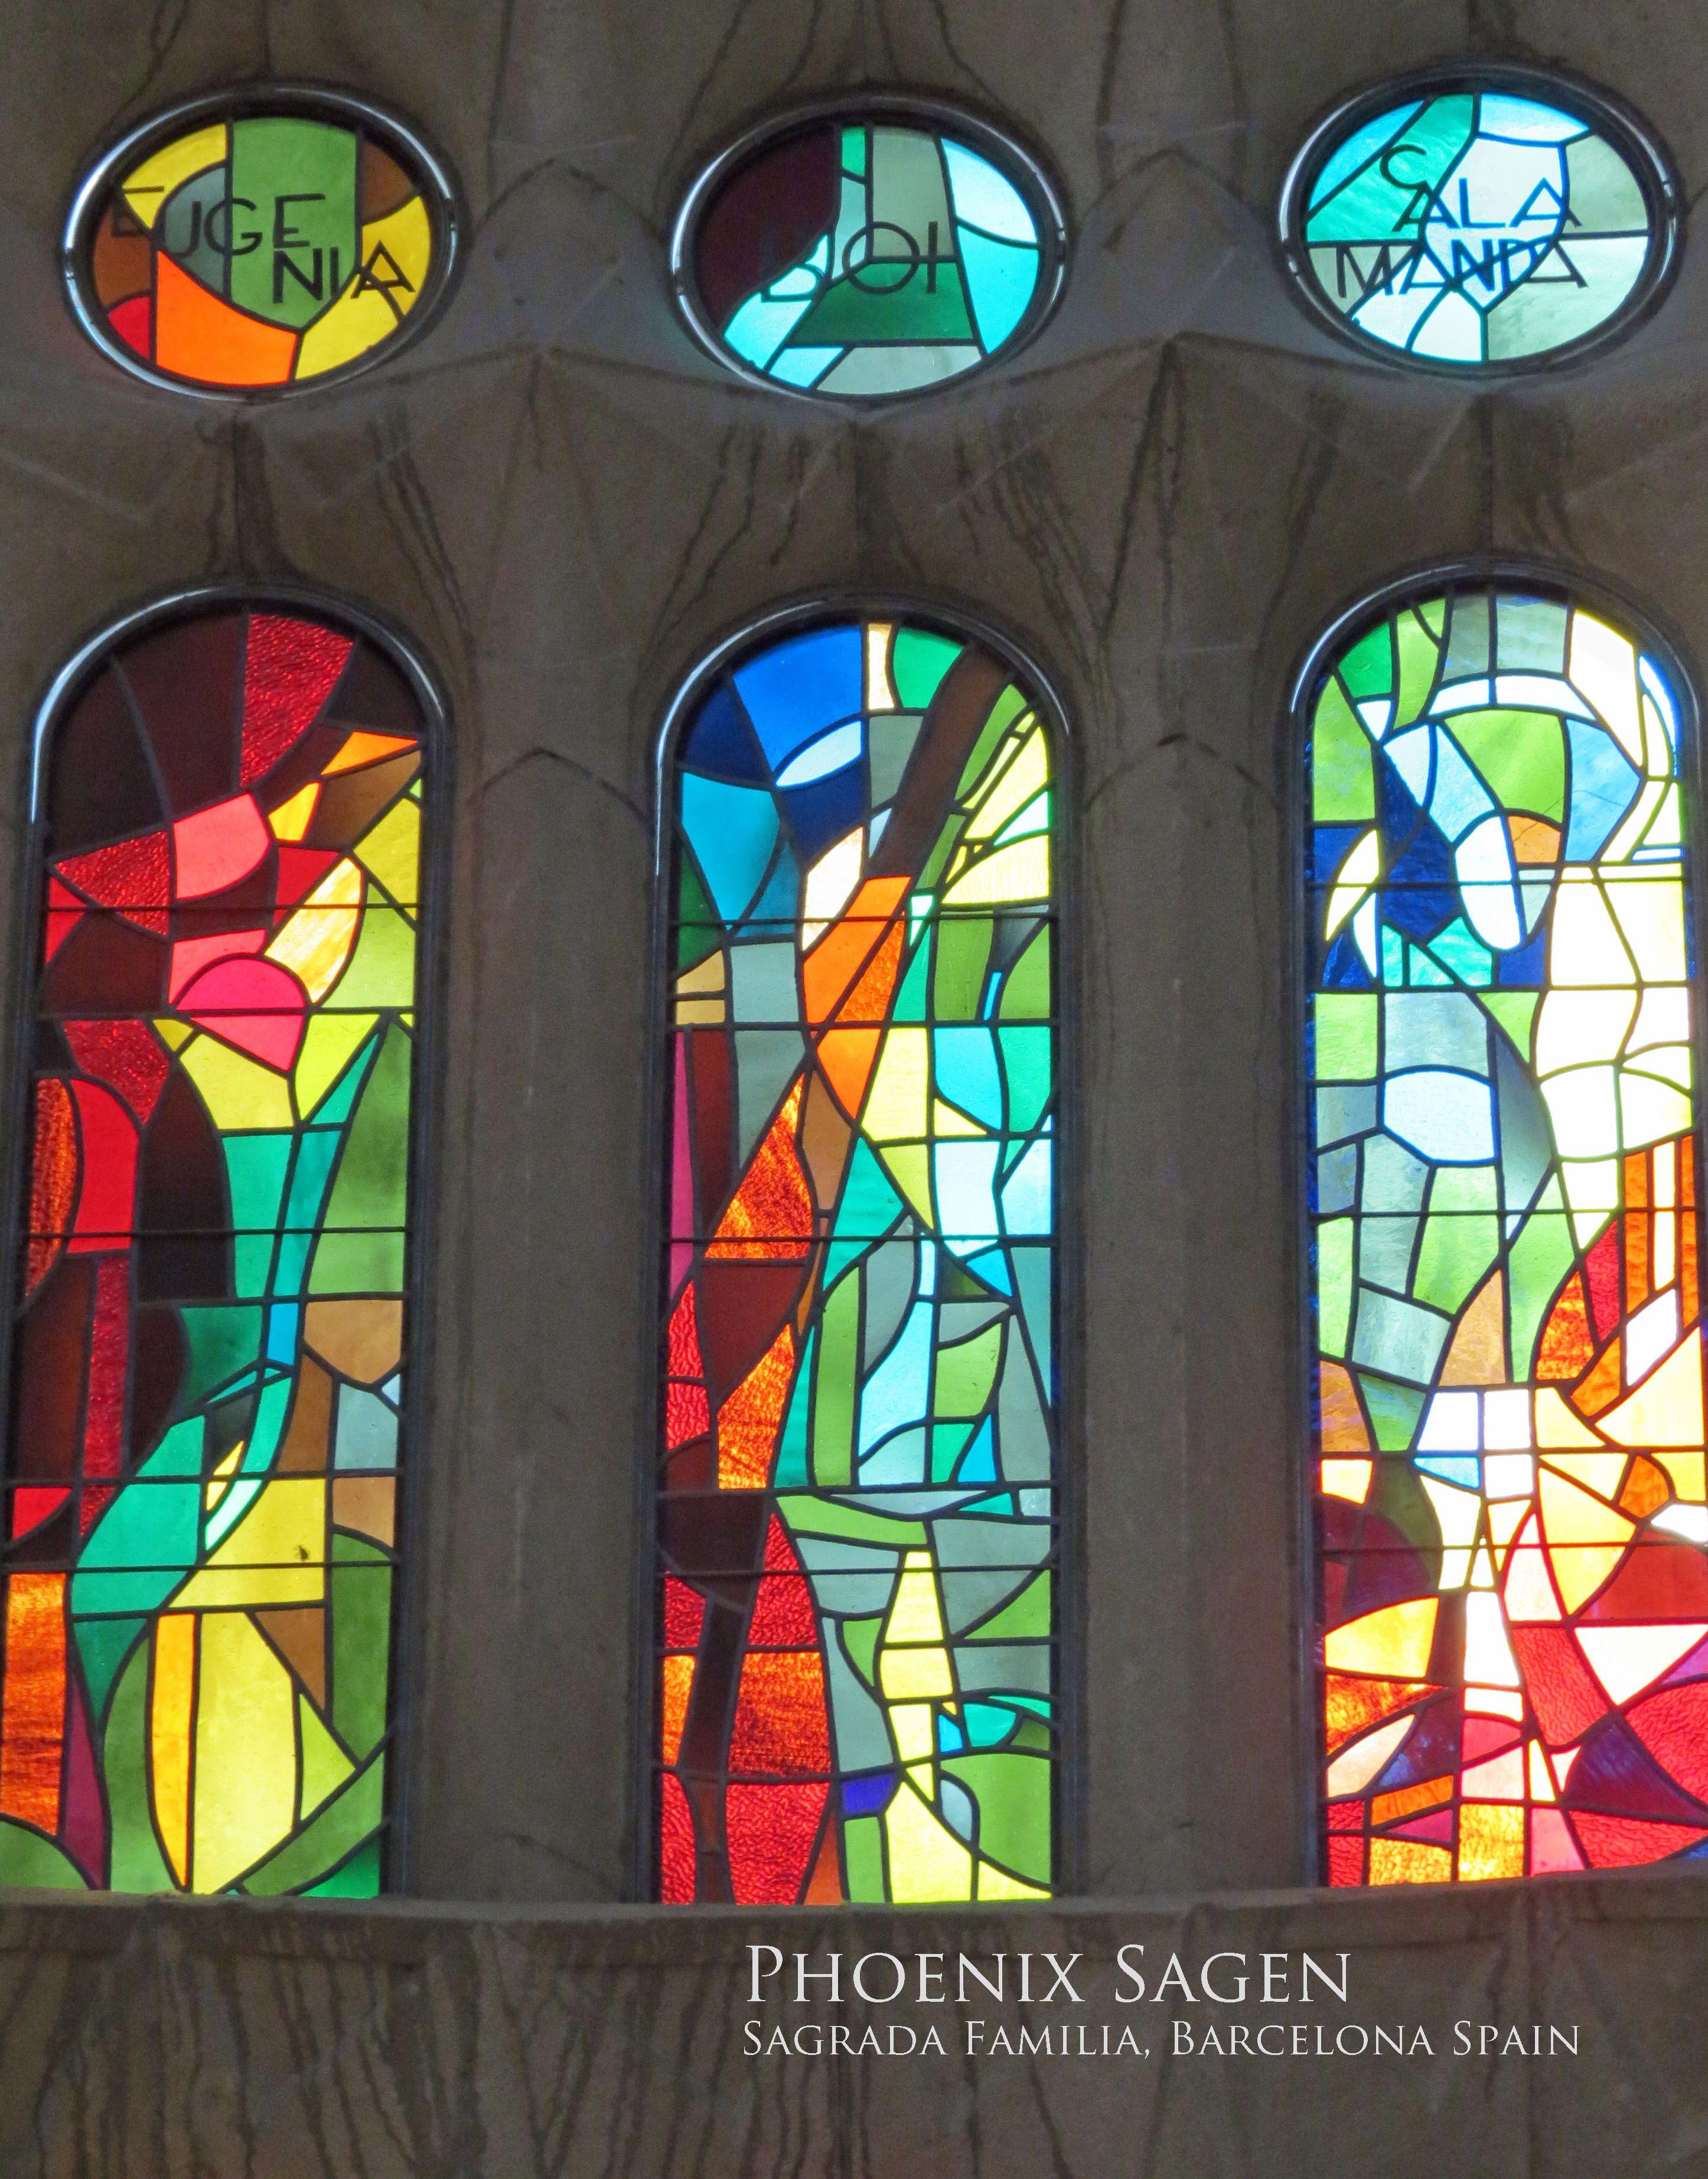 10d83d8f18b The multi-colored stained glass windows inside the Sagrada Familia ...